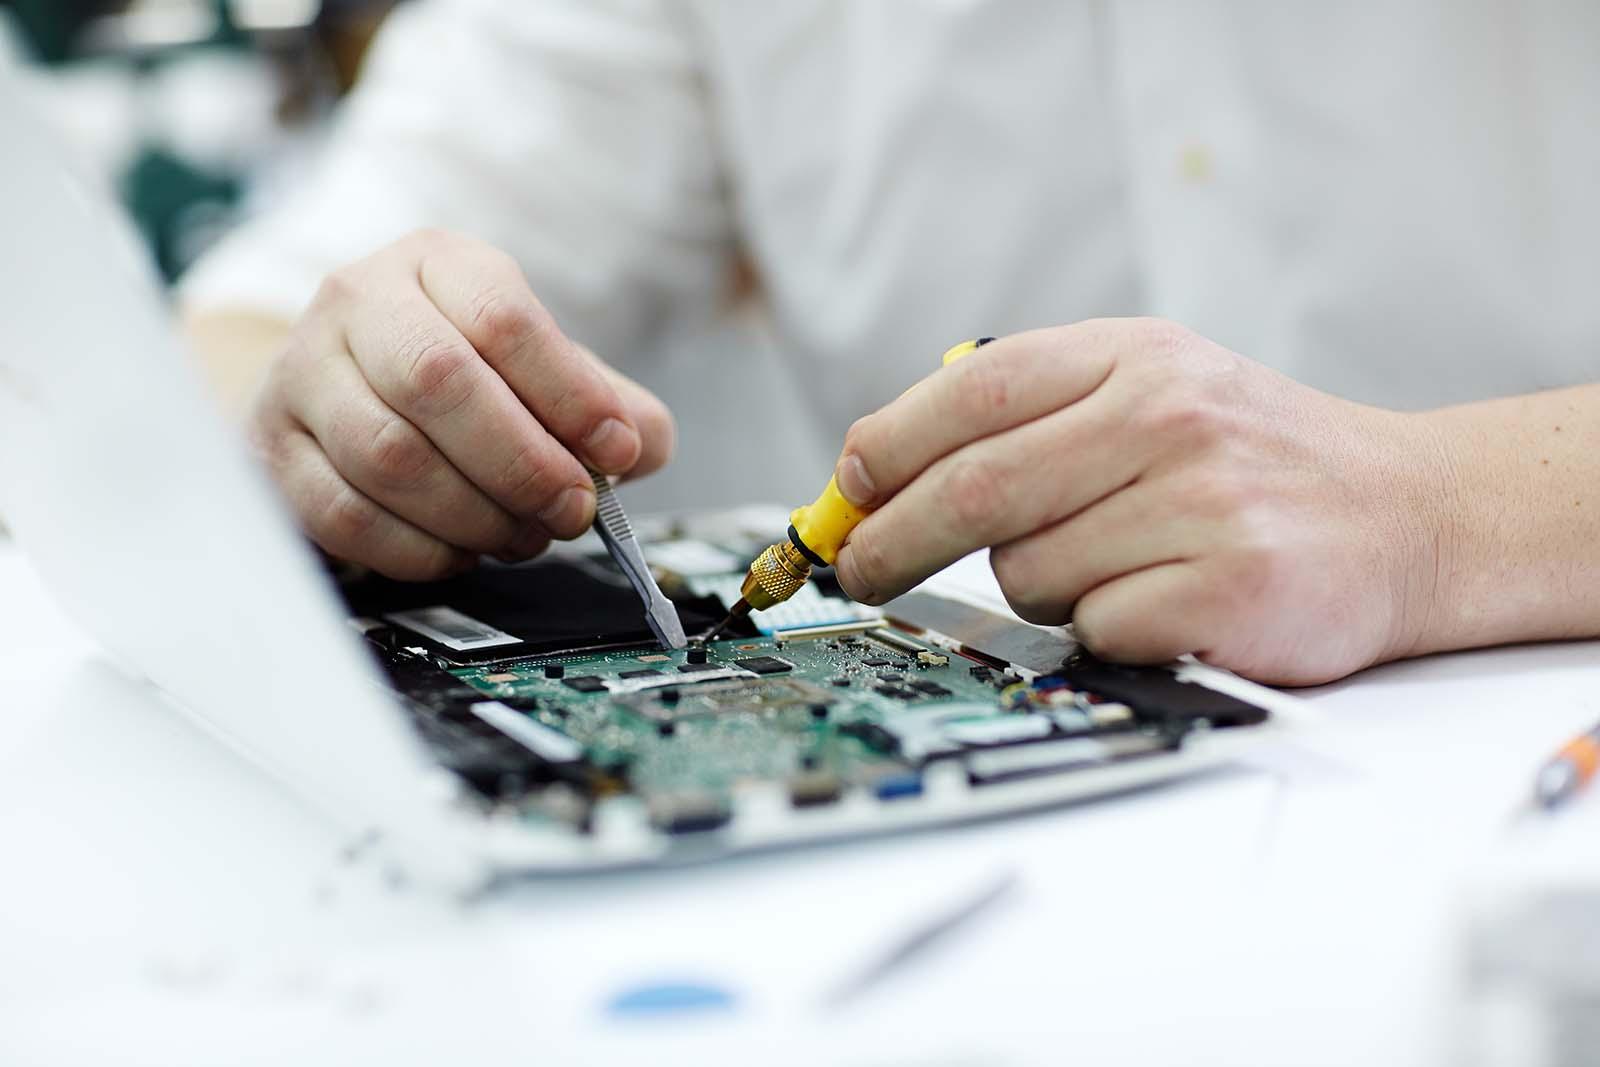 Cursos de reparación de computadoras